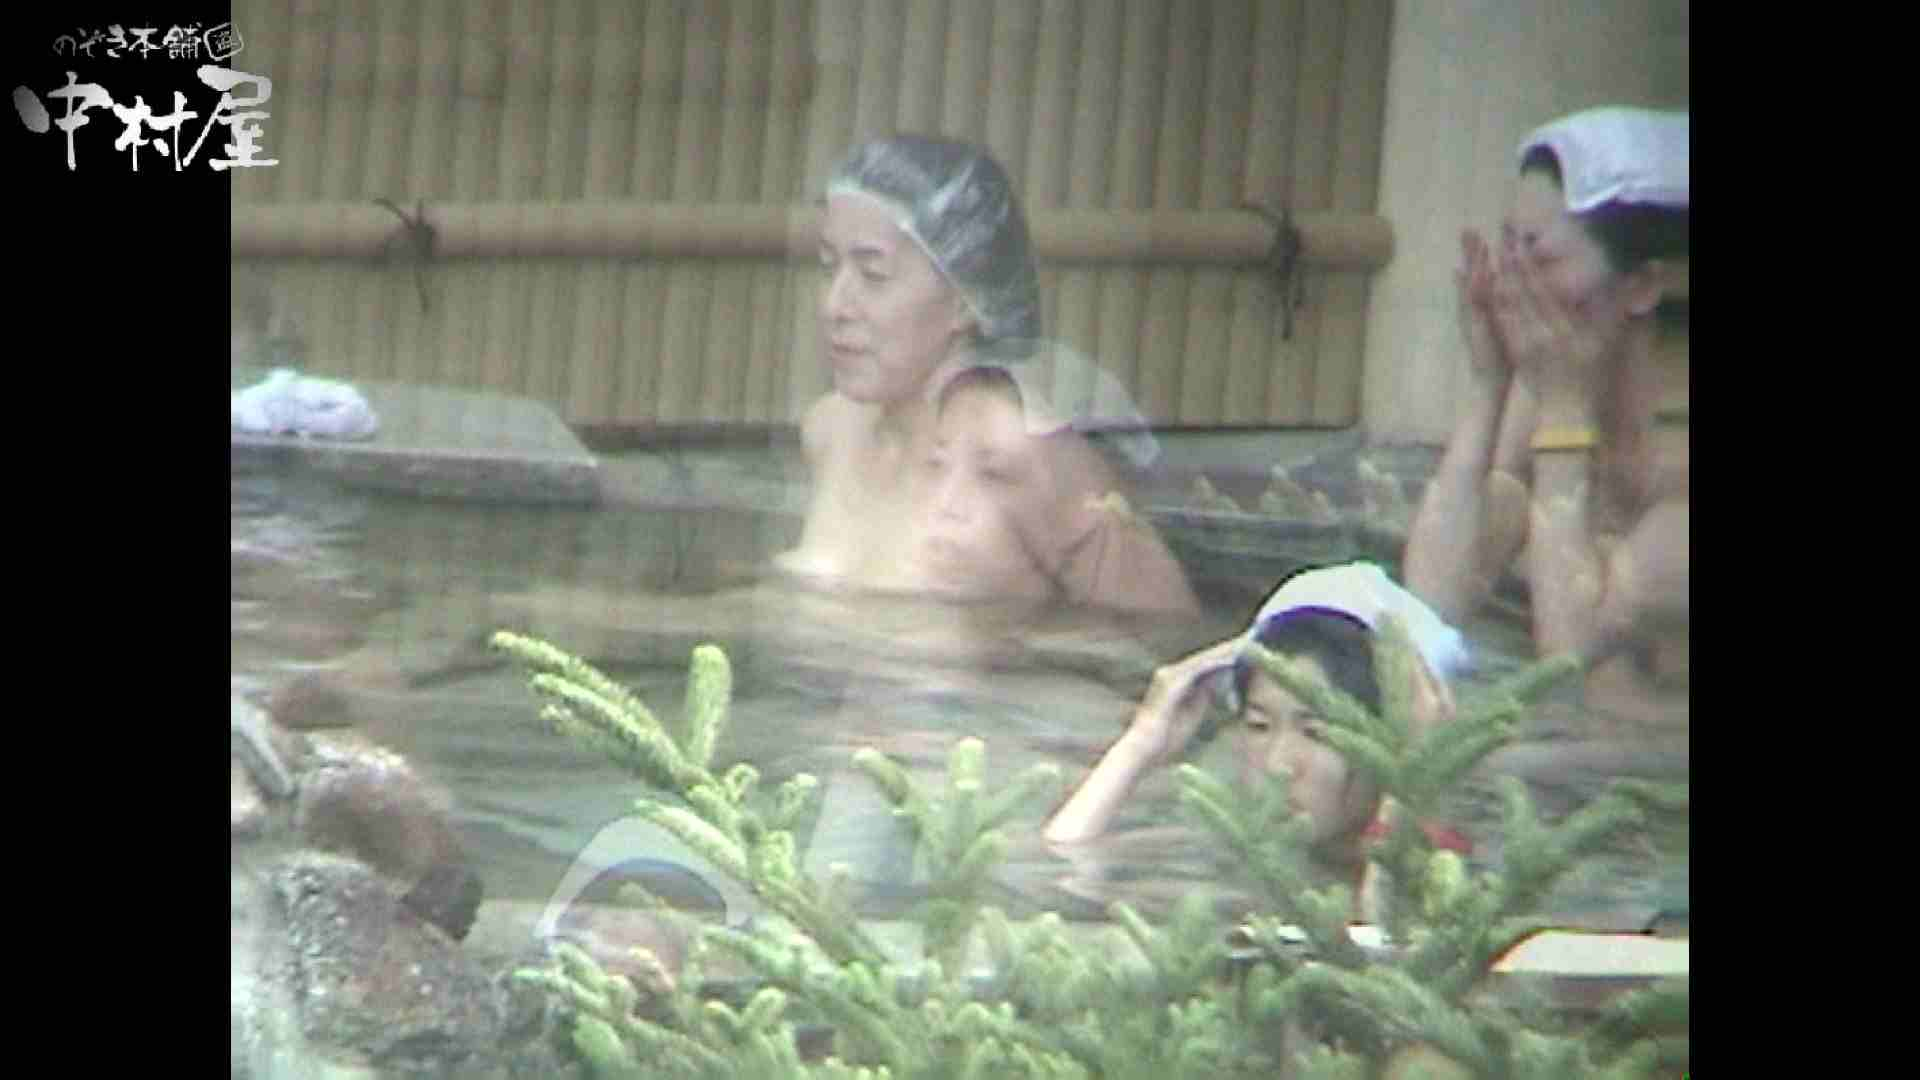 Aquaな露天風呂Vol.960 OLセックス 盗撮セックス無修正動画無料 65画像 2